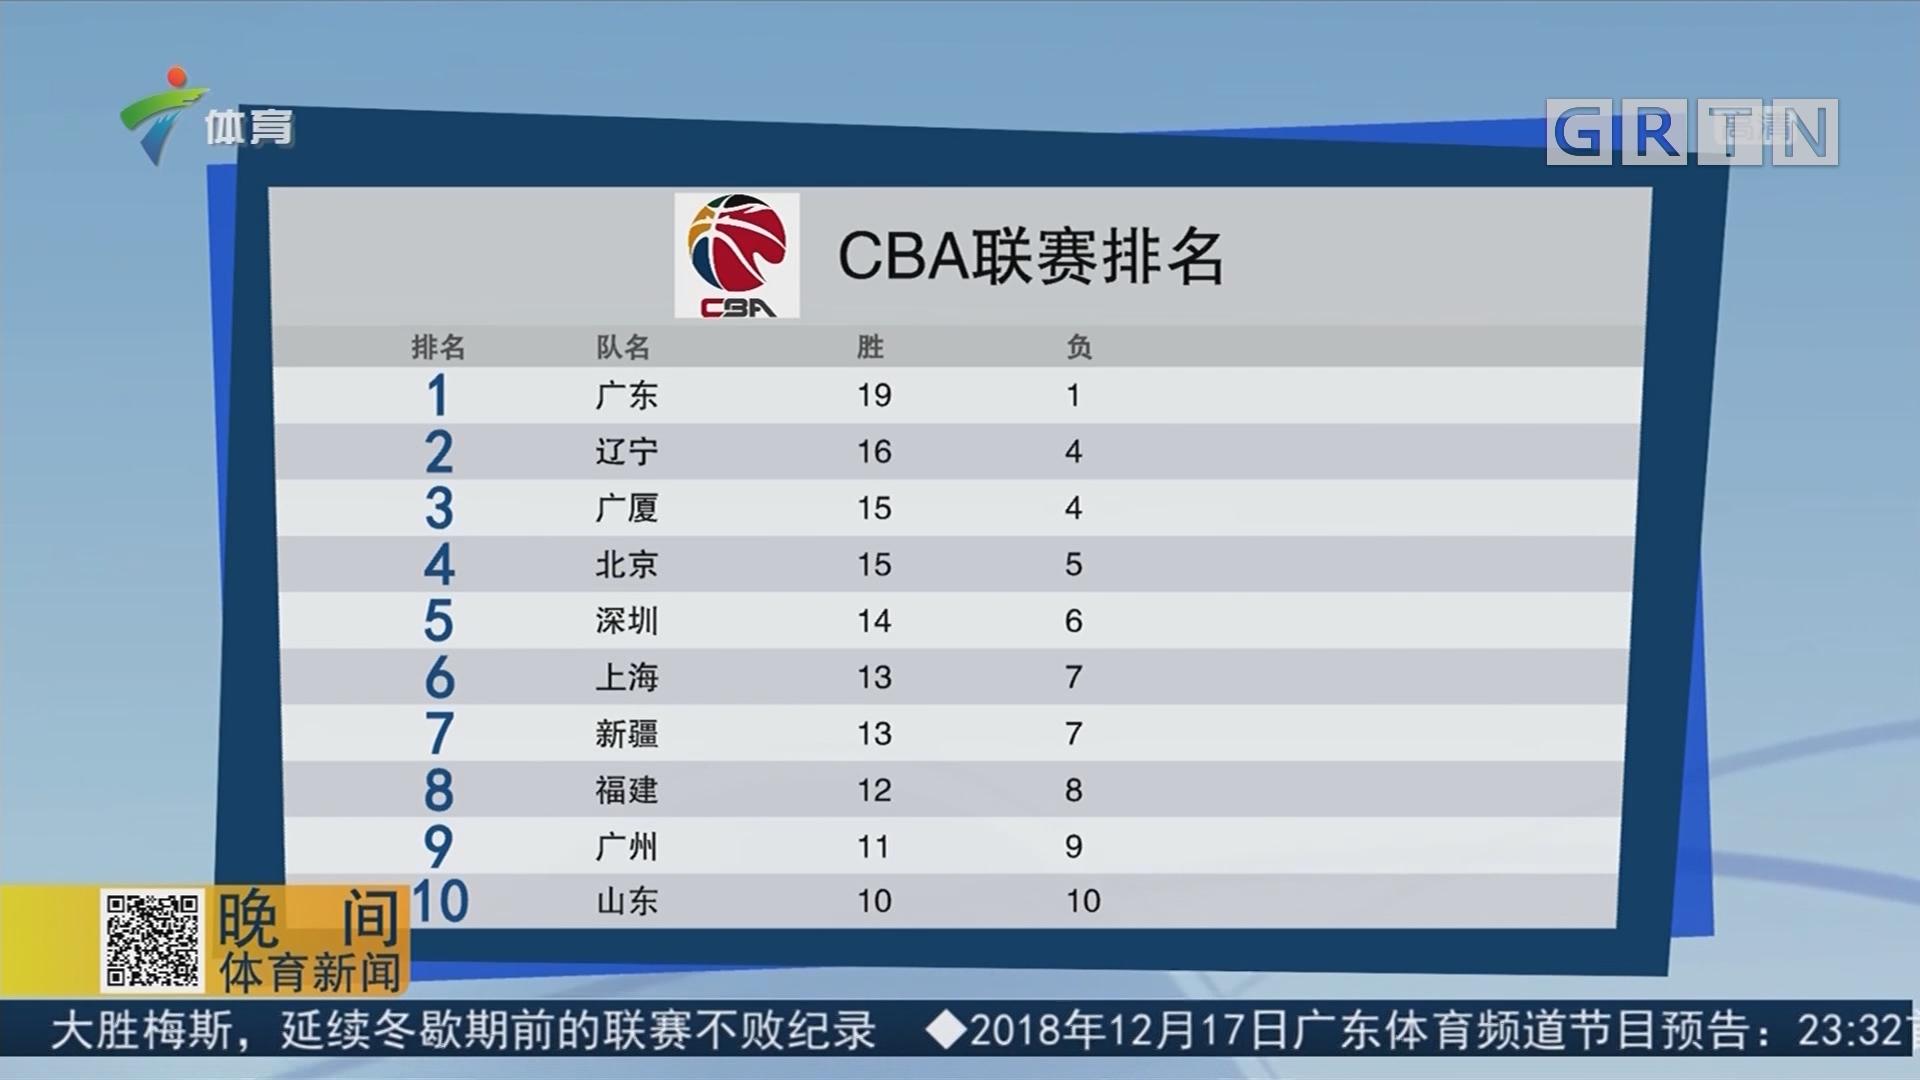 CBA联赛排名